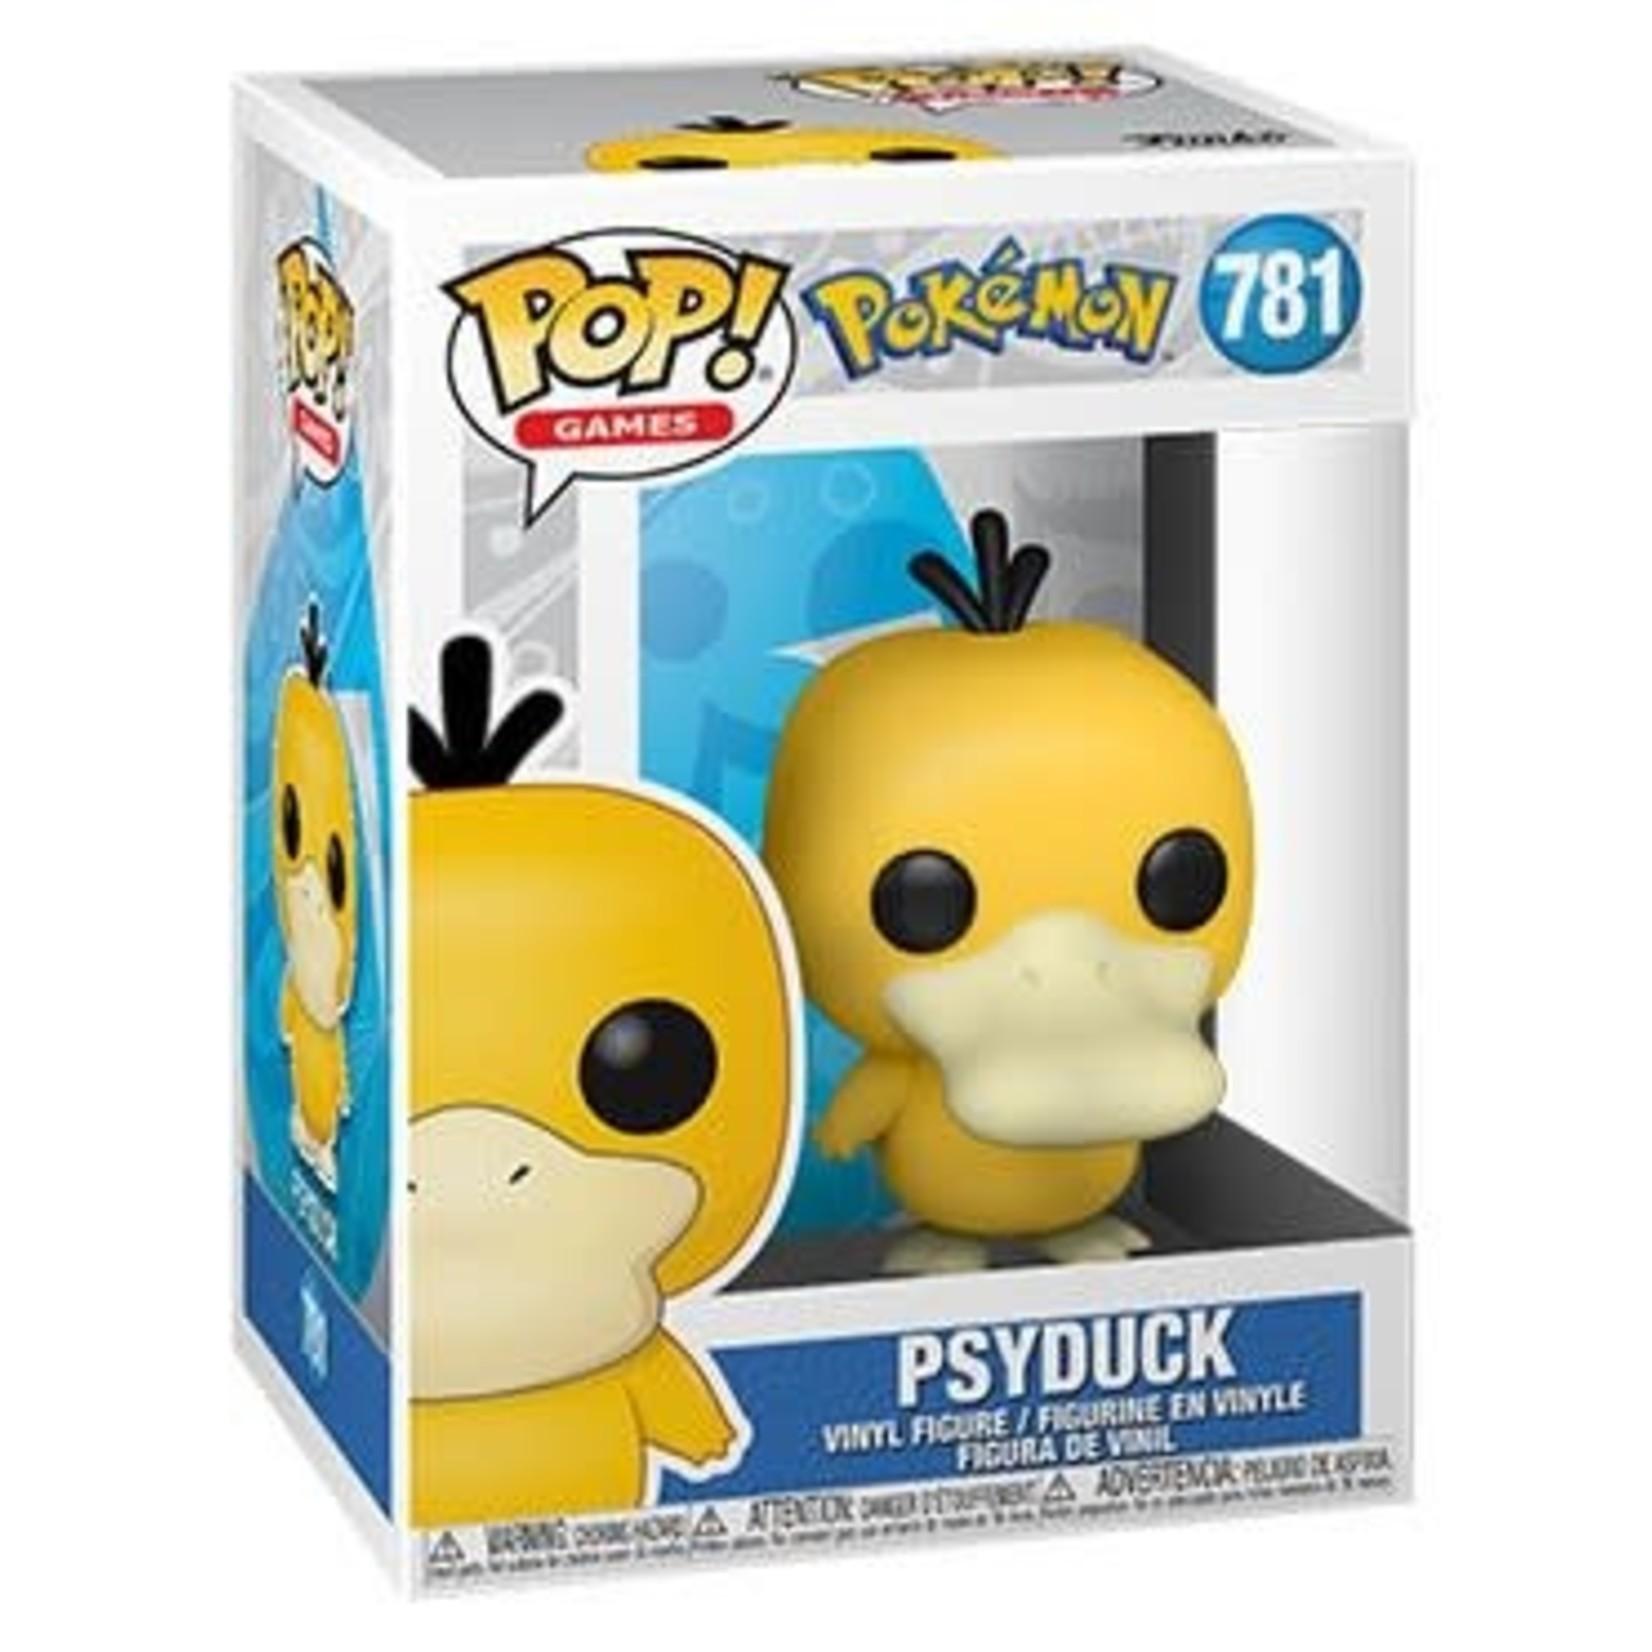 Funko Pop! POP! Games Pokemon - Psyduck